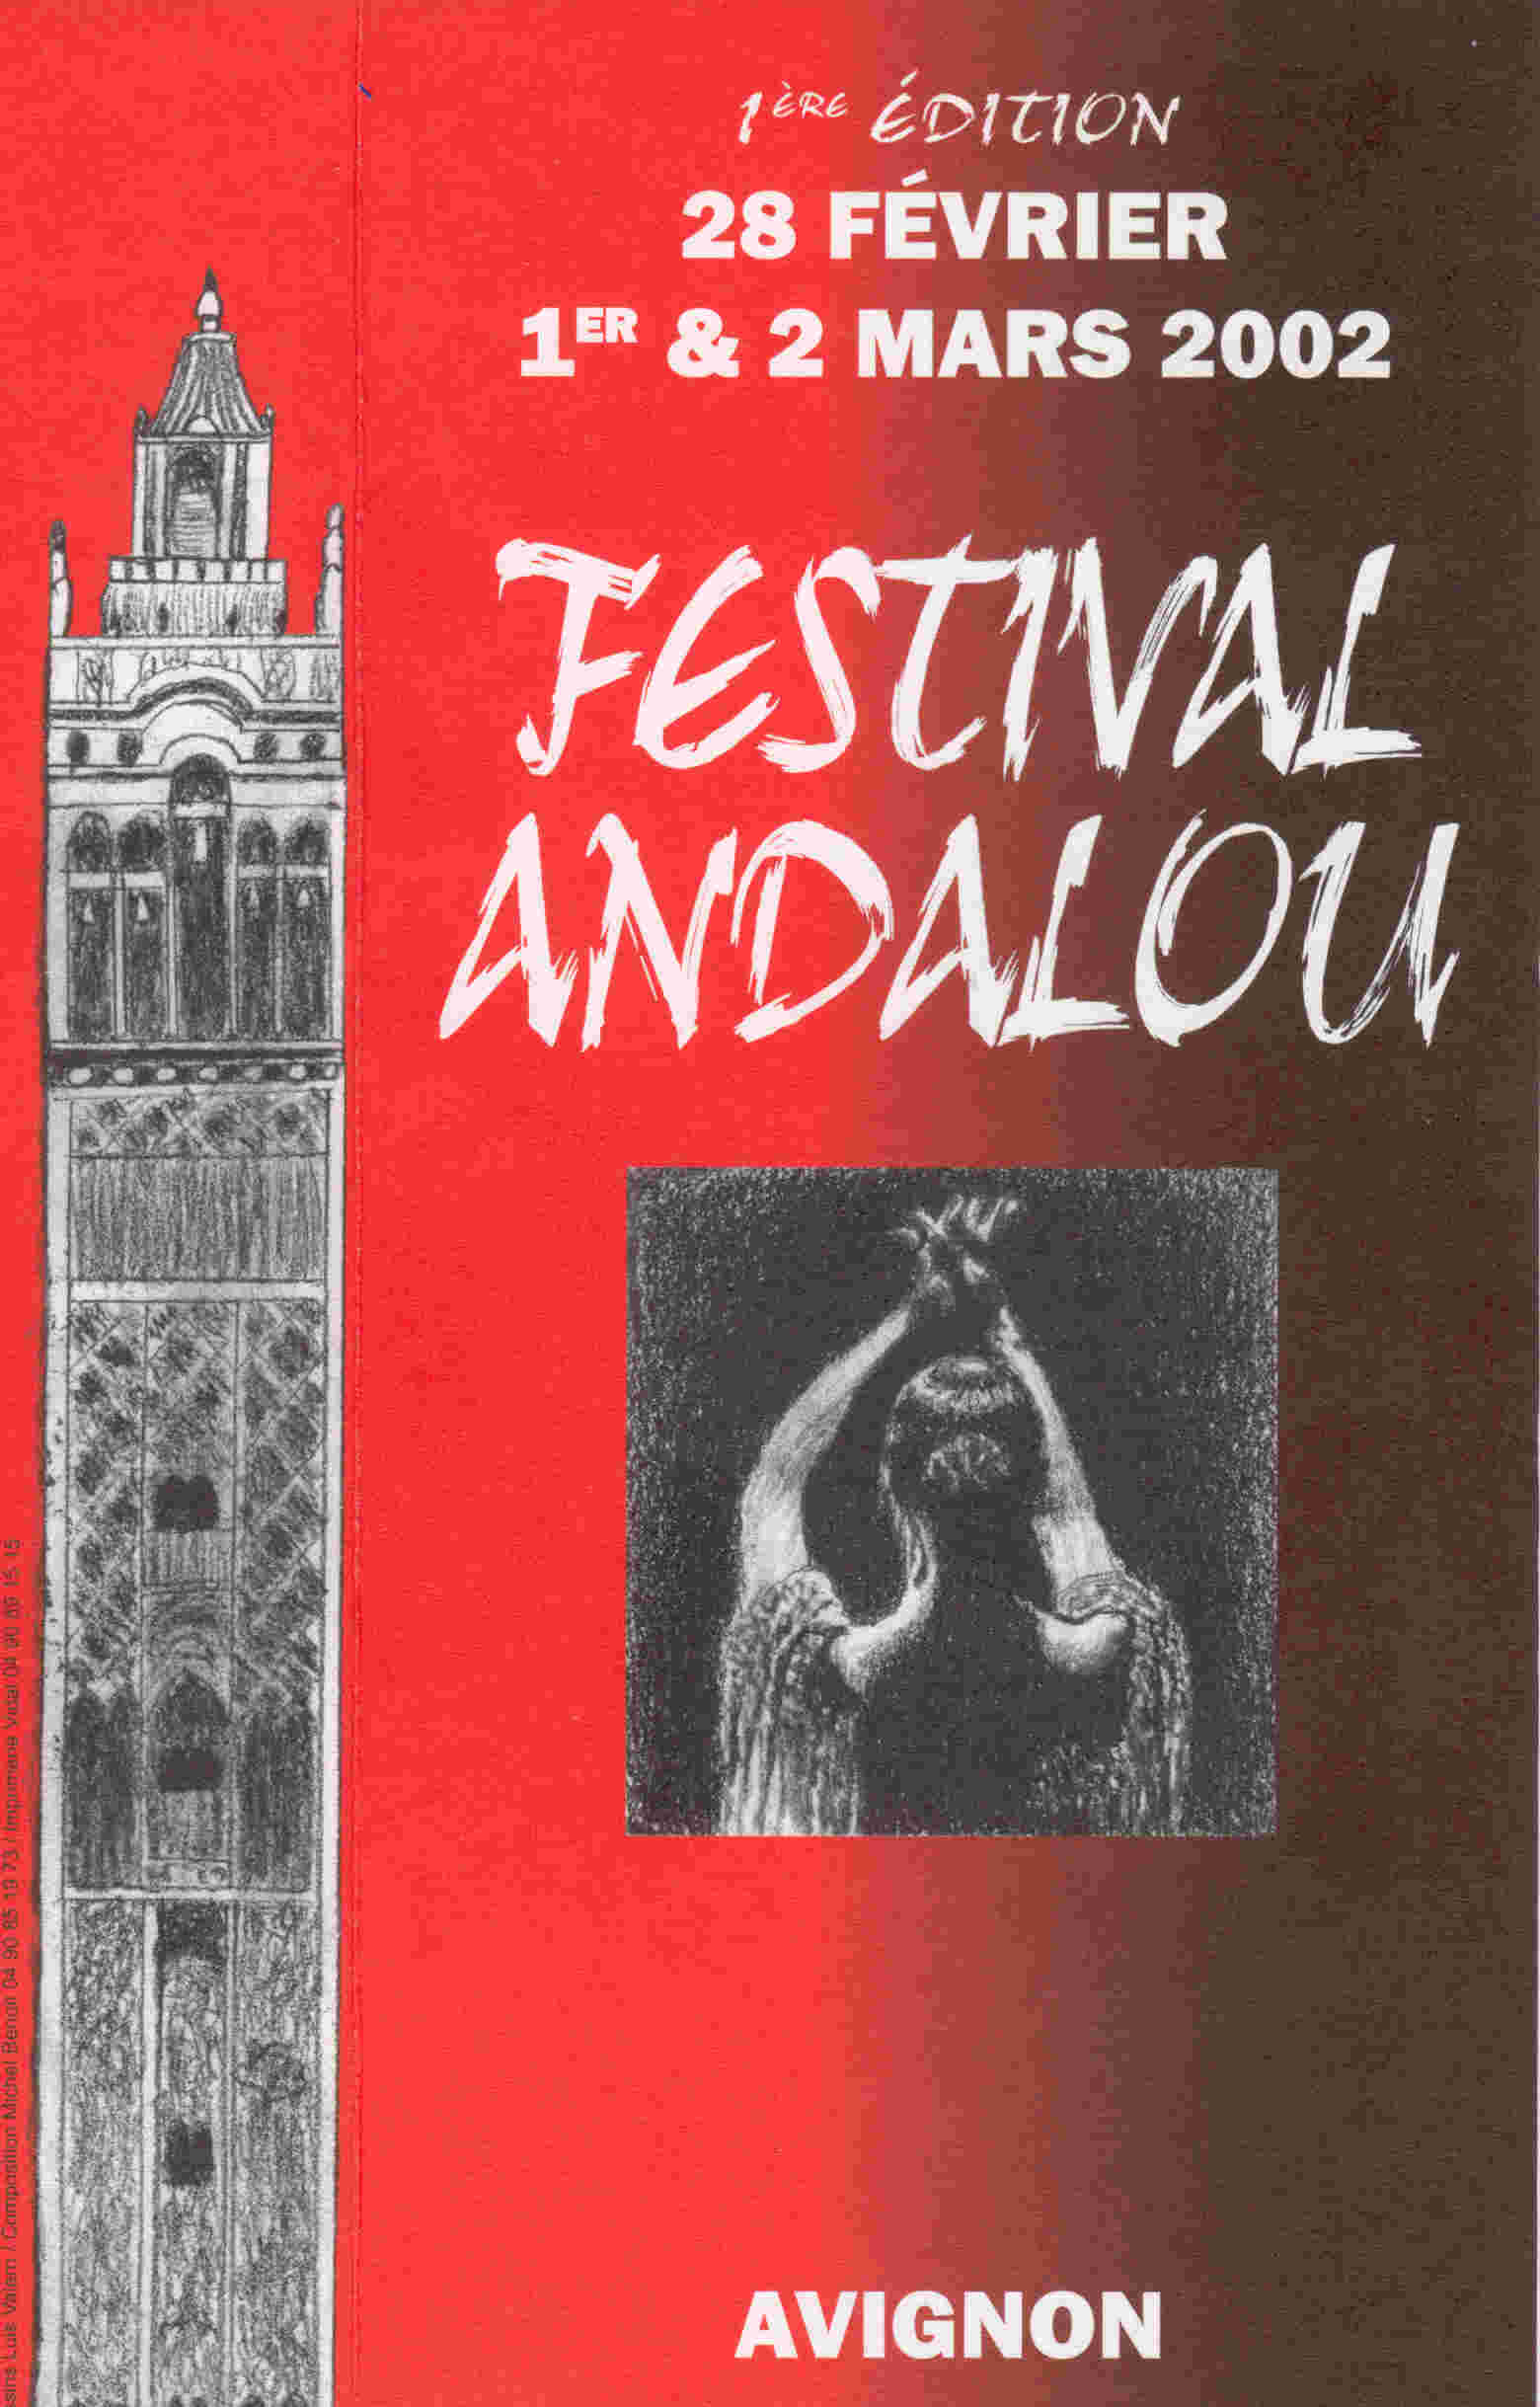 Festival Andalou - 1st edition